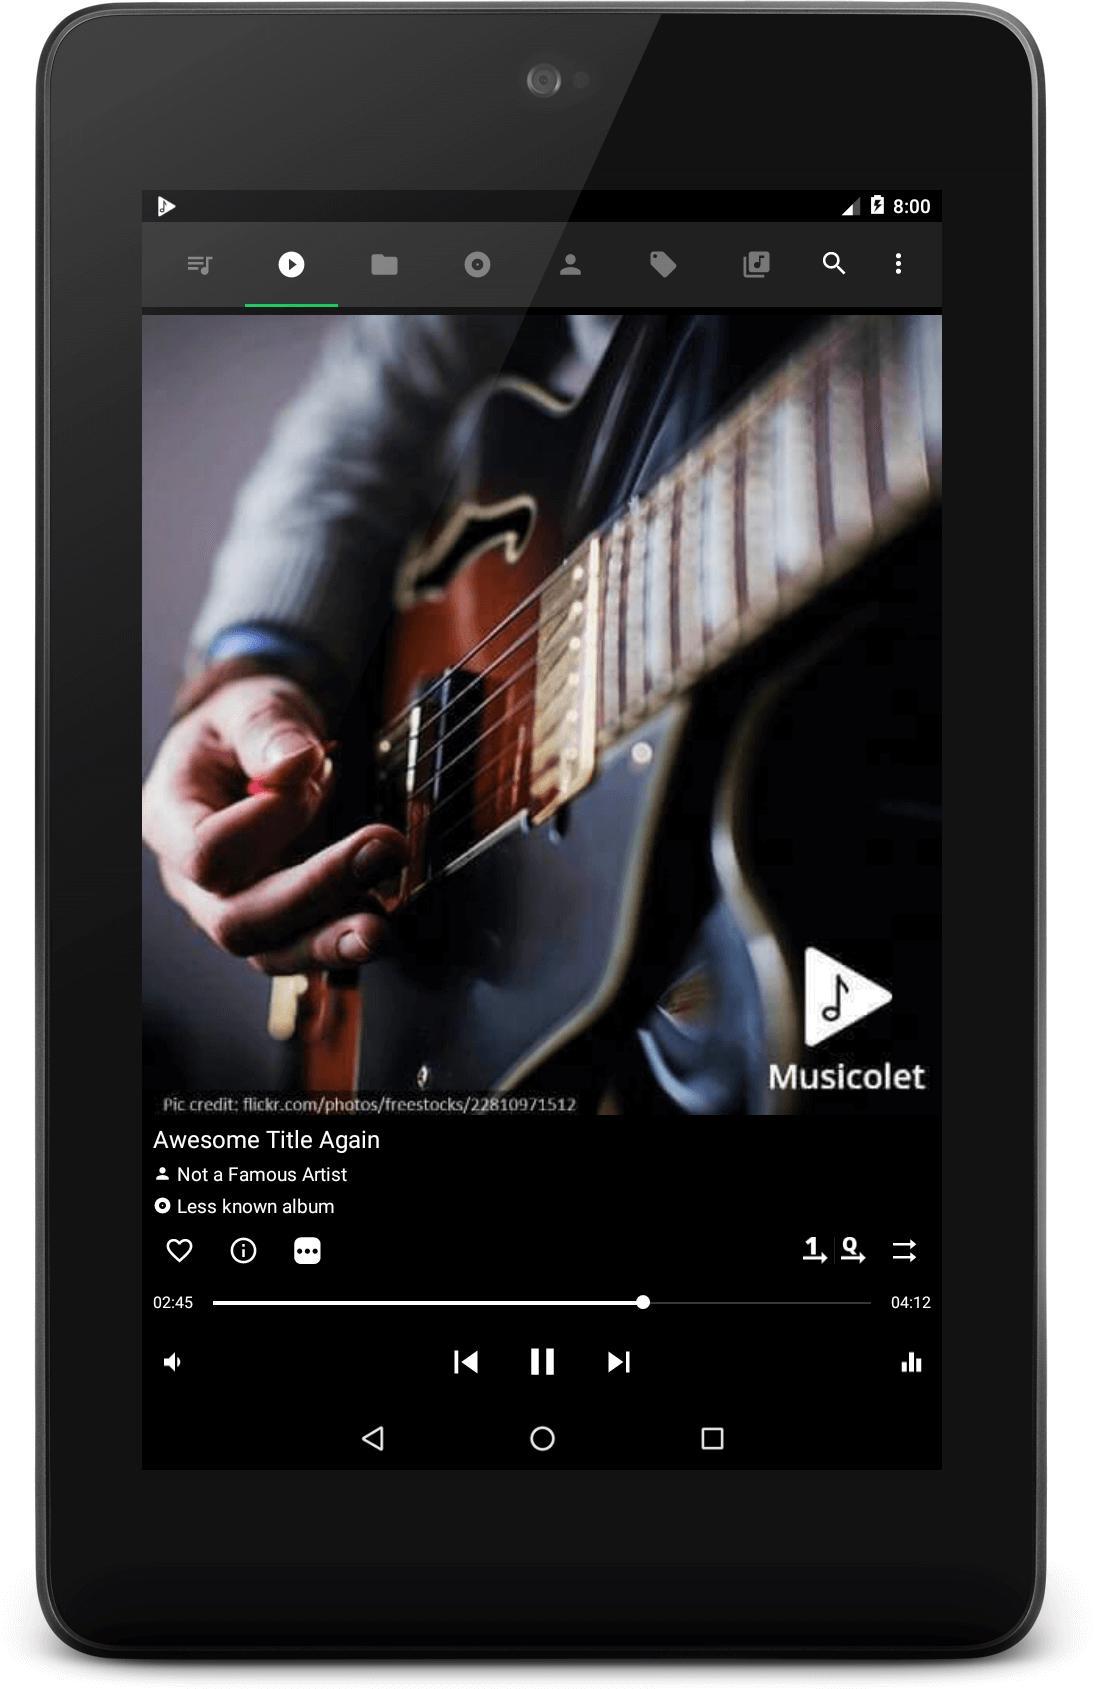 Musicolet Music Player [Free, No ads] 4.2.1 build182 Screenshot 12